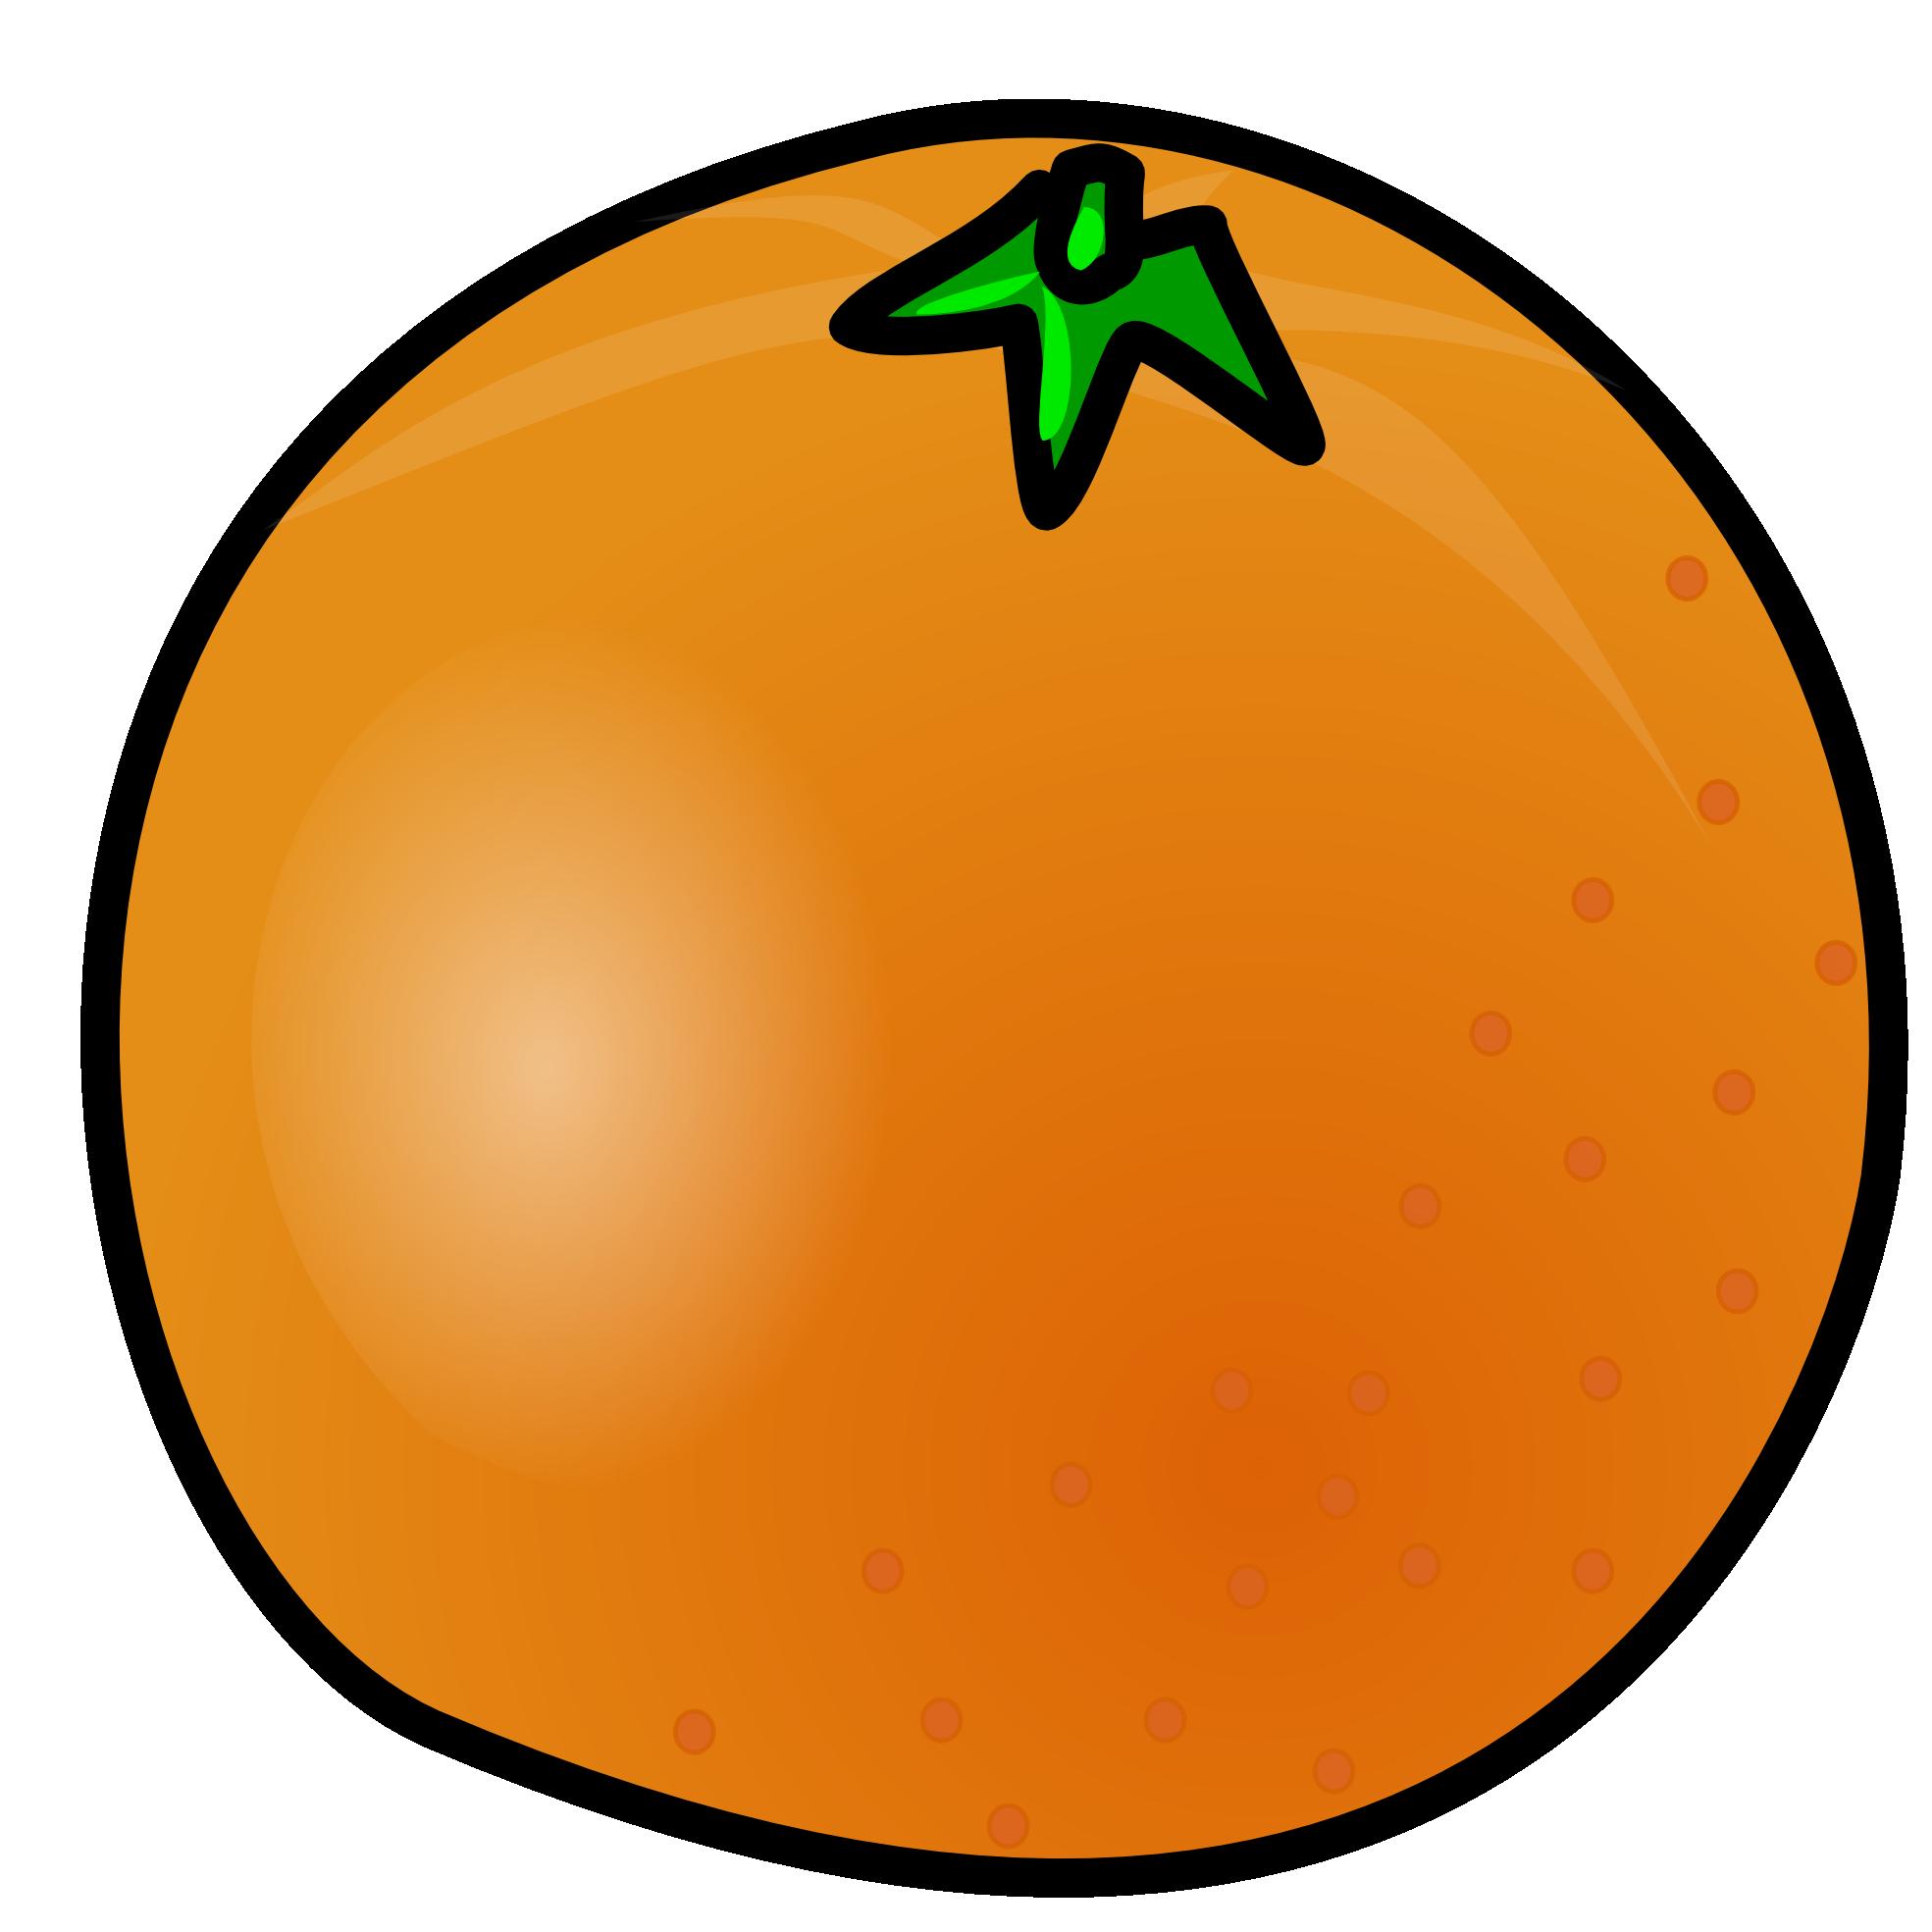 Orange clipart #12, Download drawings